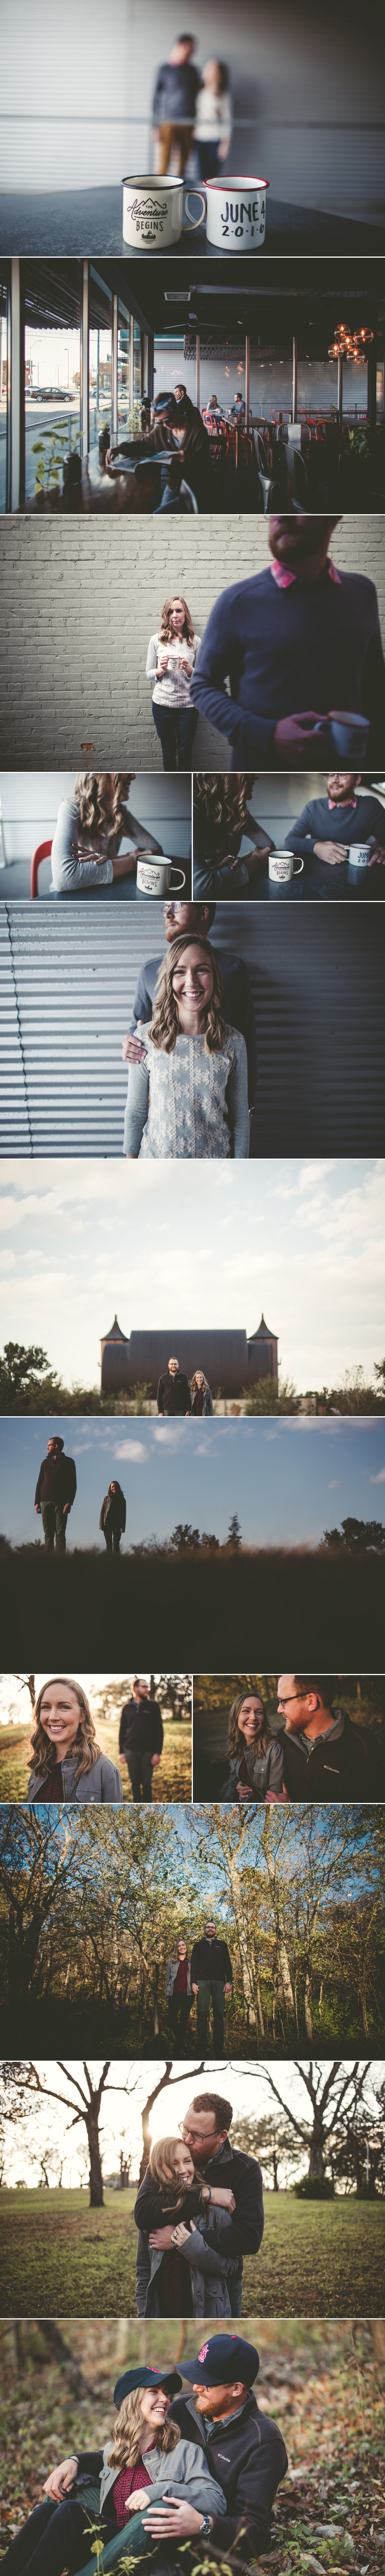 jason_domingues_photography_best_kansas_city_wedding_photographer_kc_engagement_session_waldo_coffee_girls_swope_park